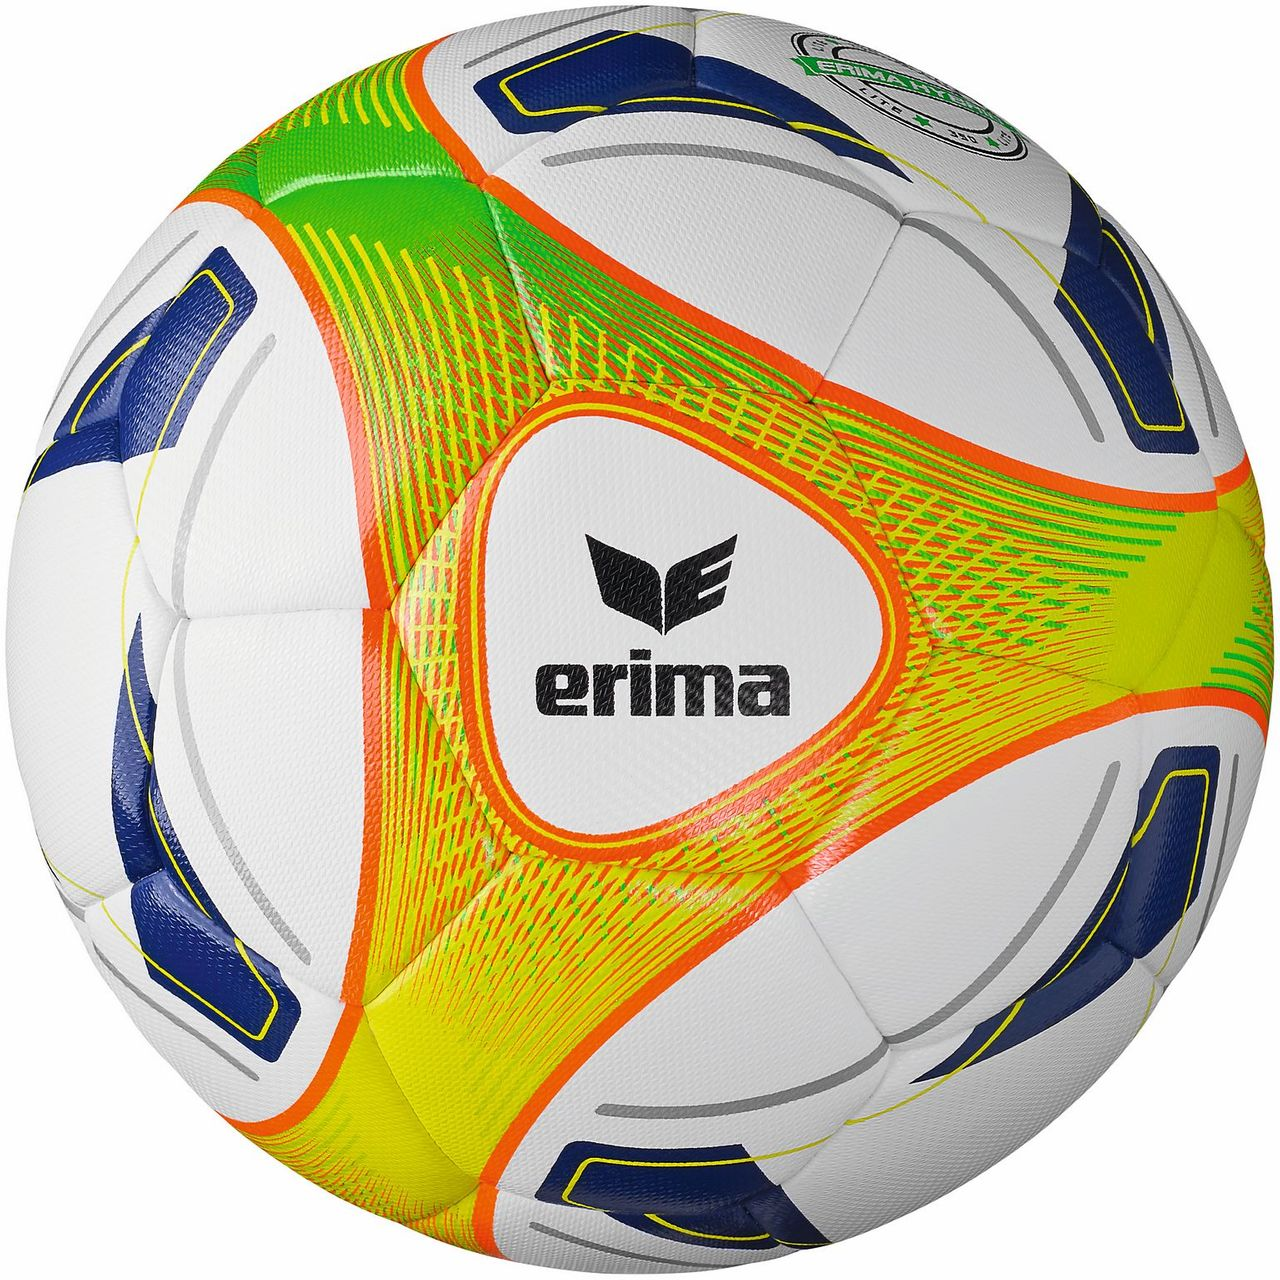 10 x erima Jugendball Hybrid Lite 350 inkl. Ballsack